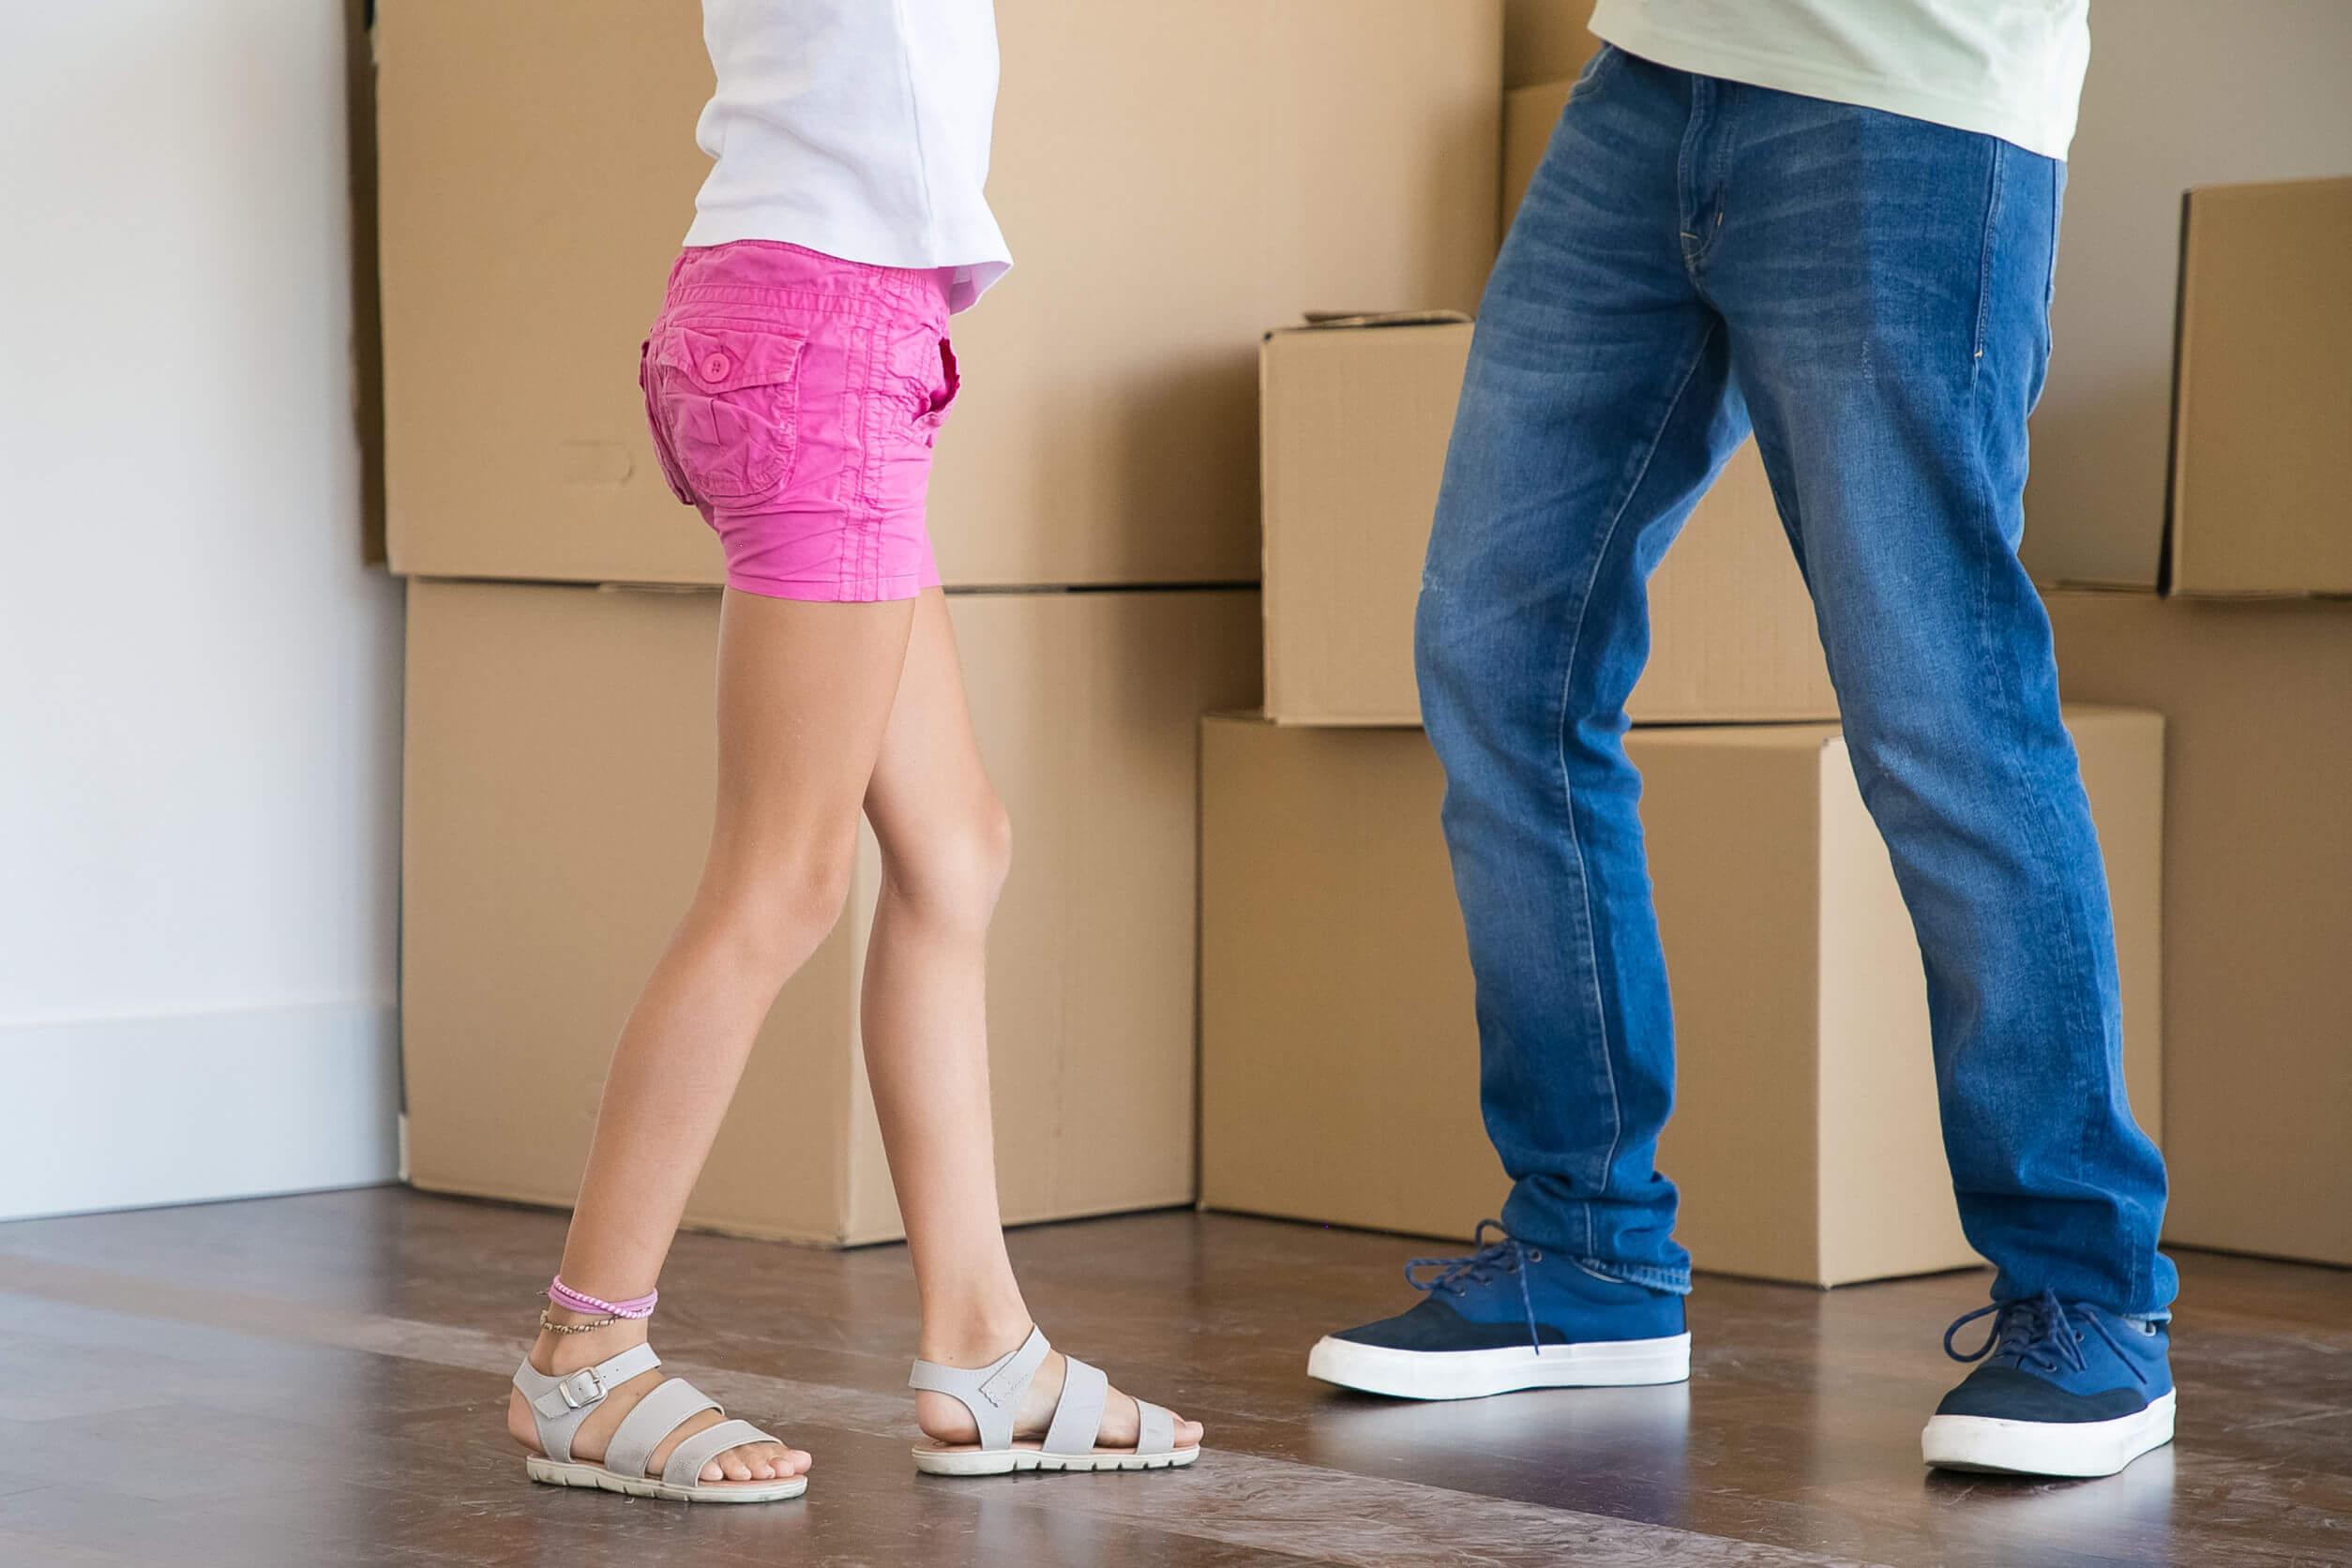 Padre e hija rodeados de cajas de cartón.